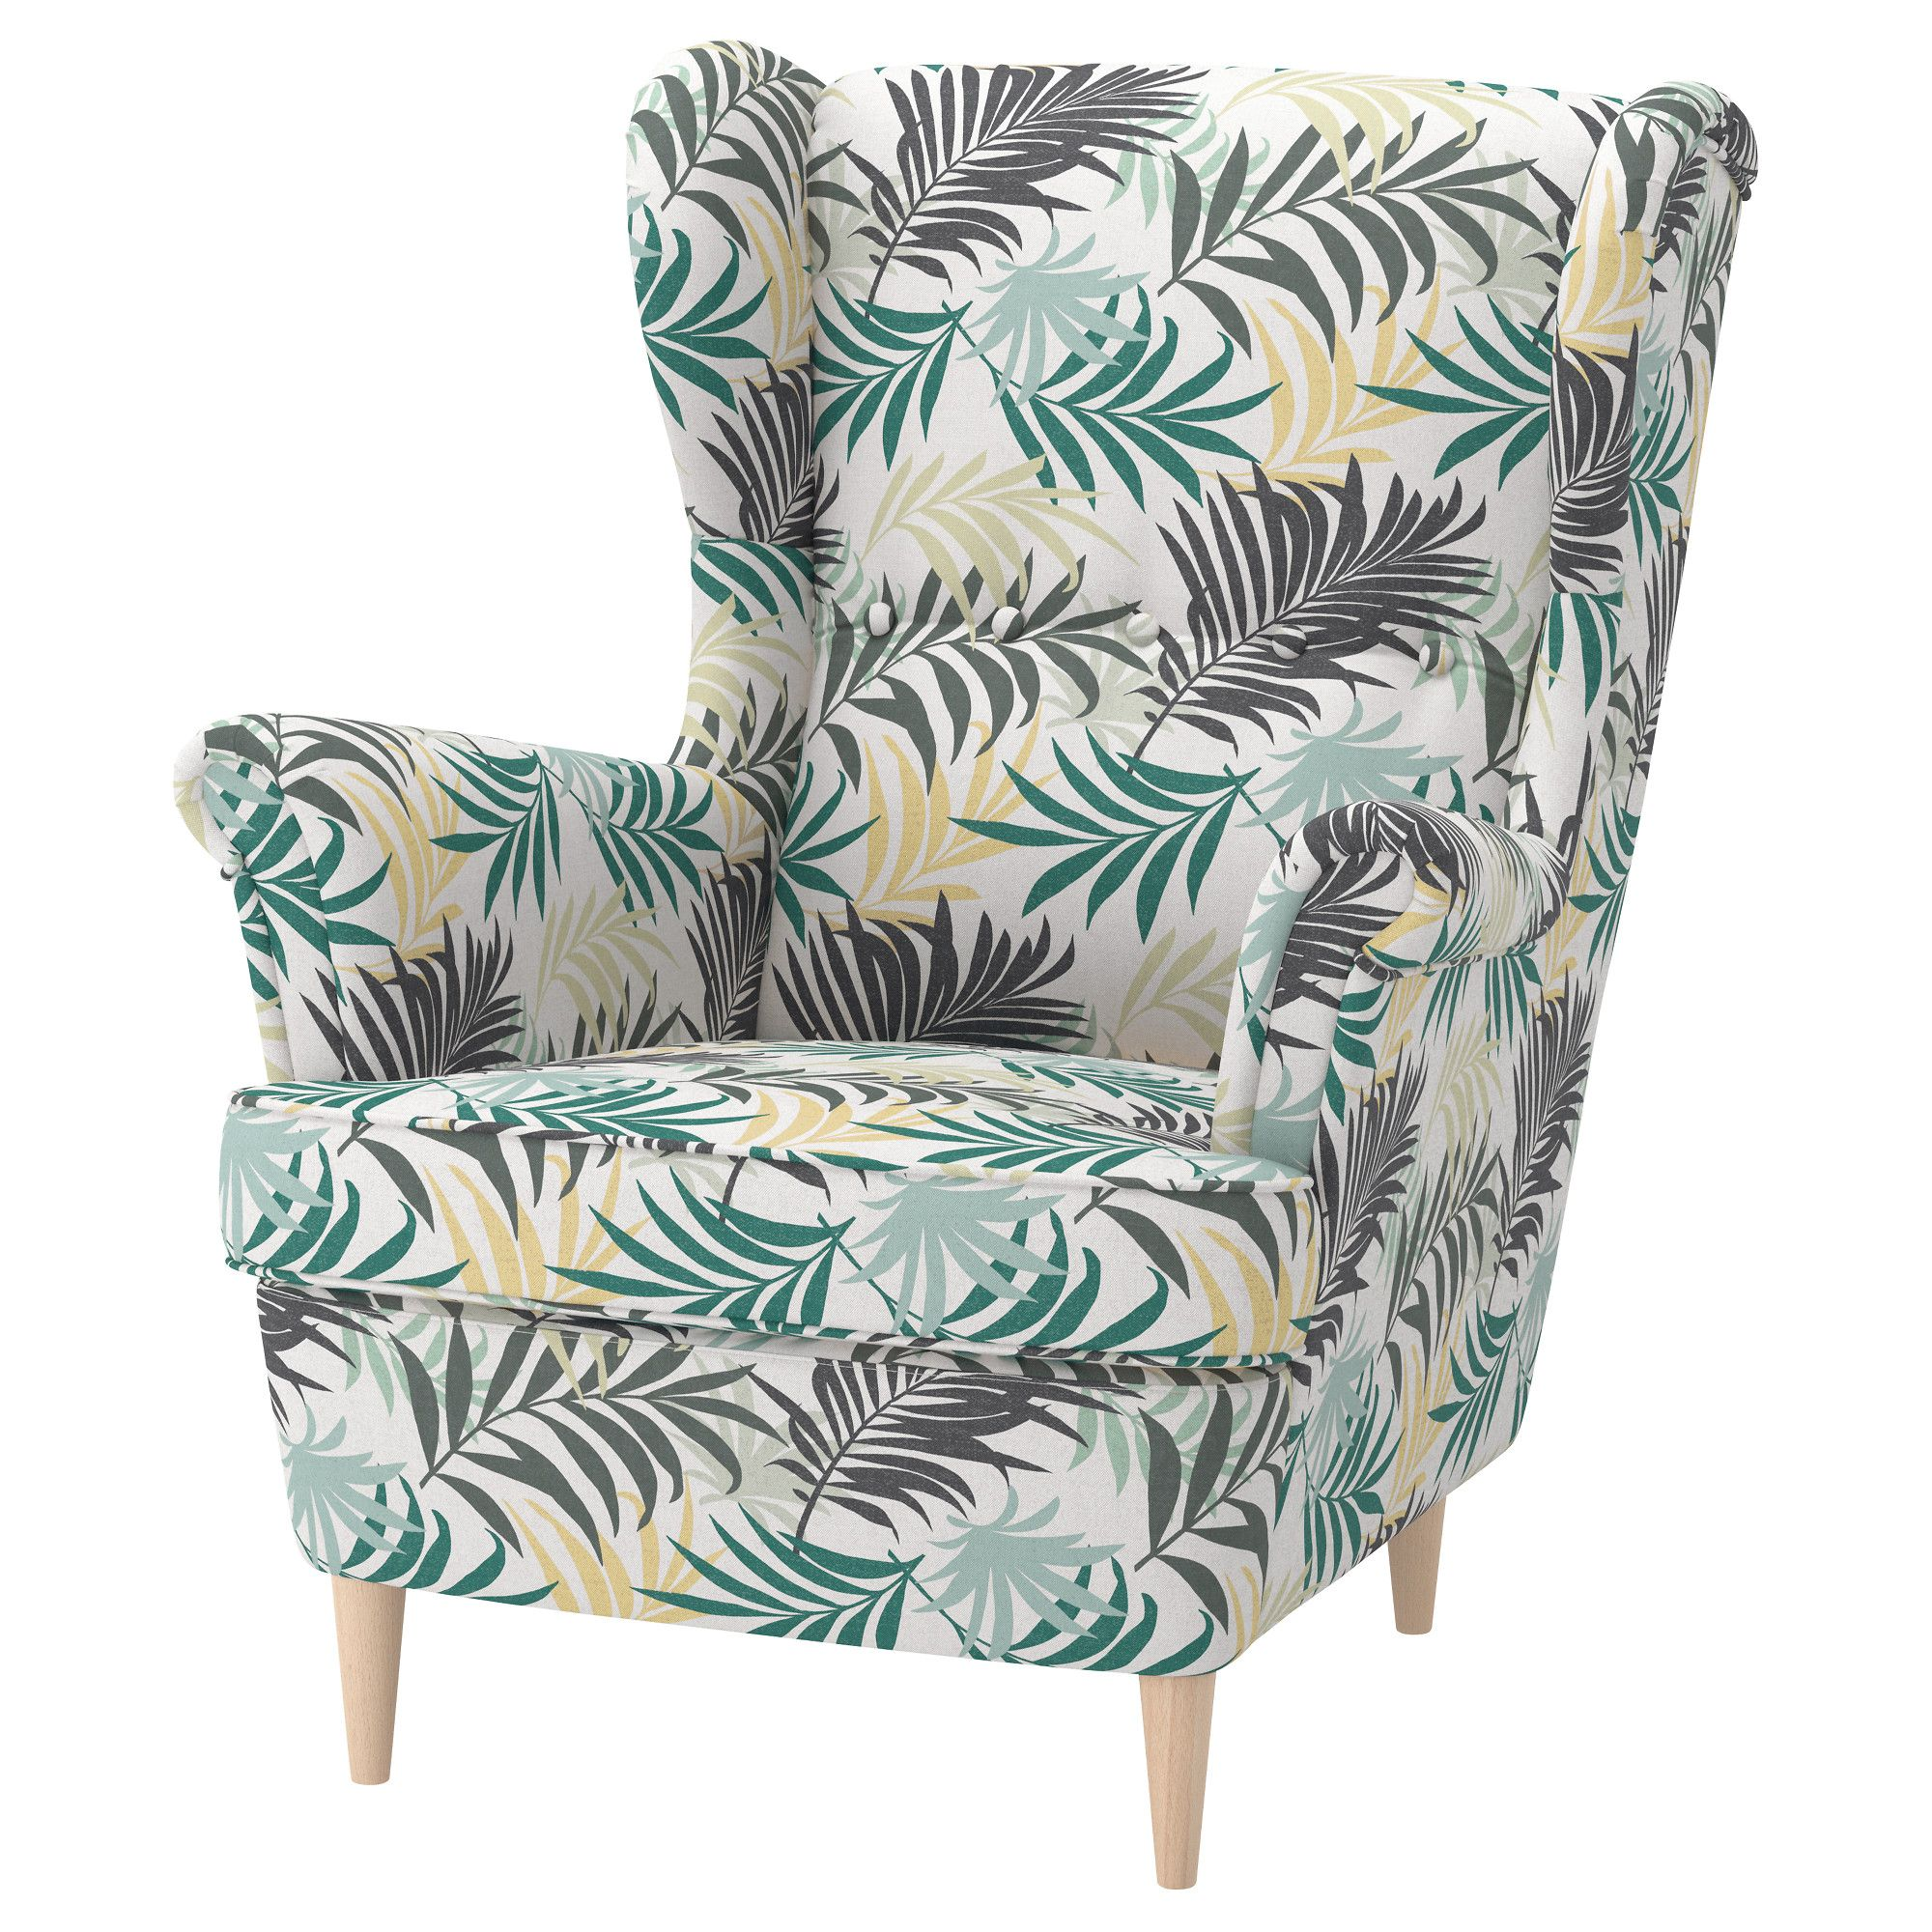 STRANDMON Wing chair Gillhov multicolor Ideas for M in